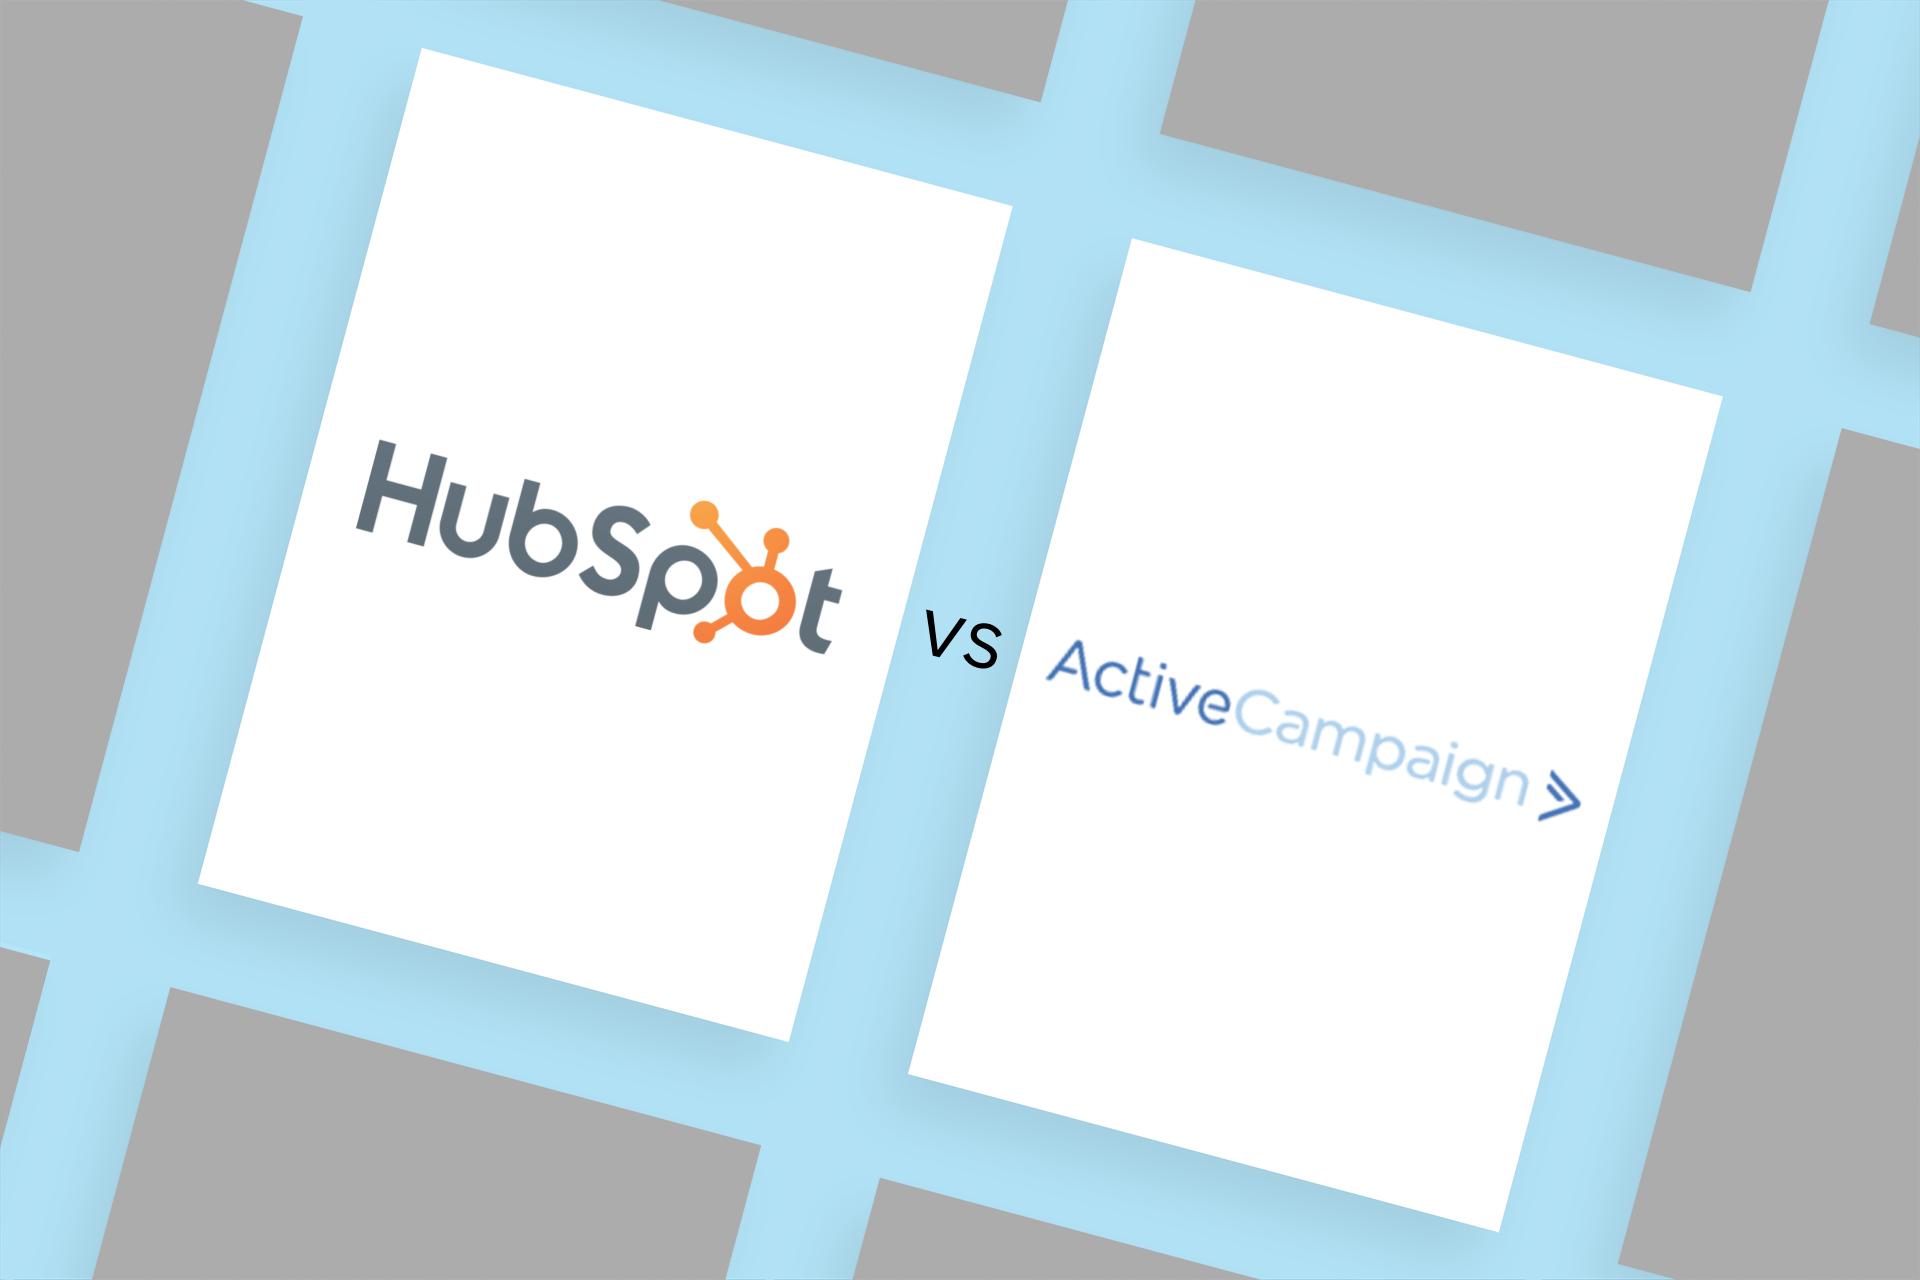 HubSpot vs. ActiveCampaign: a head-to-head comparison